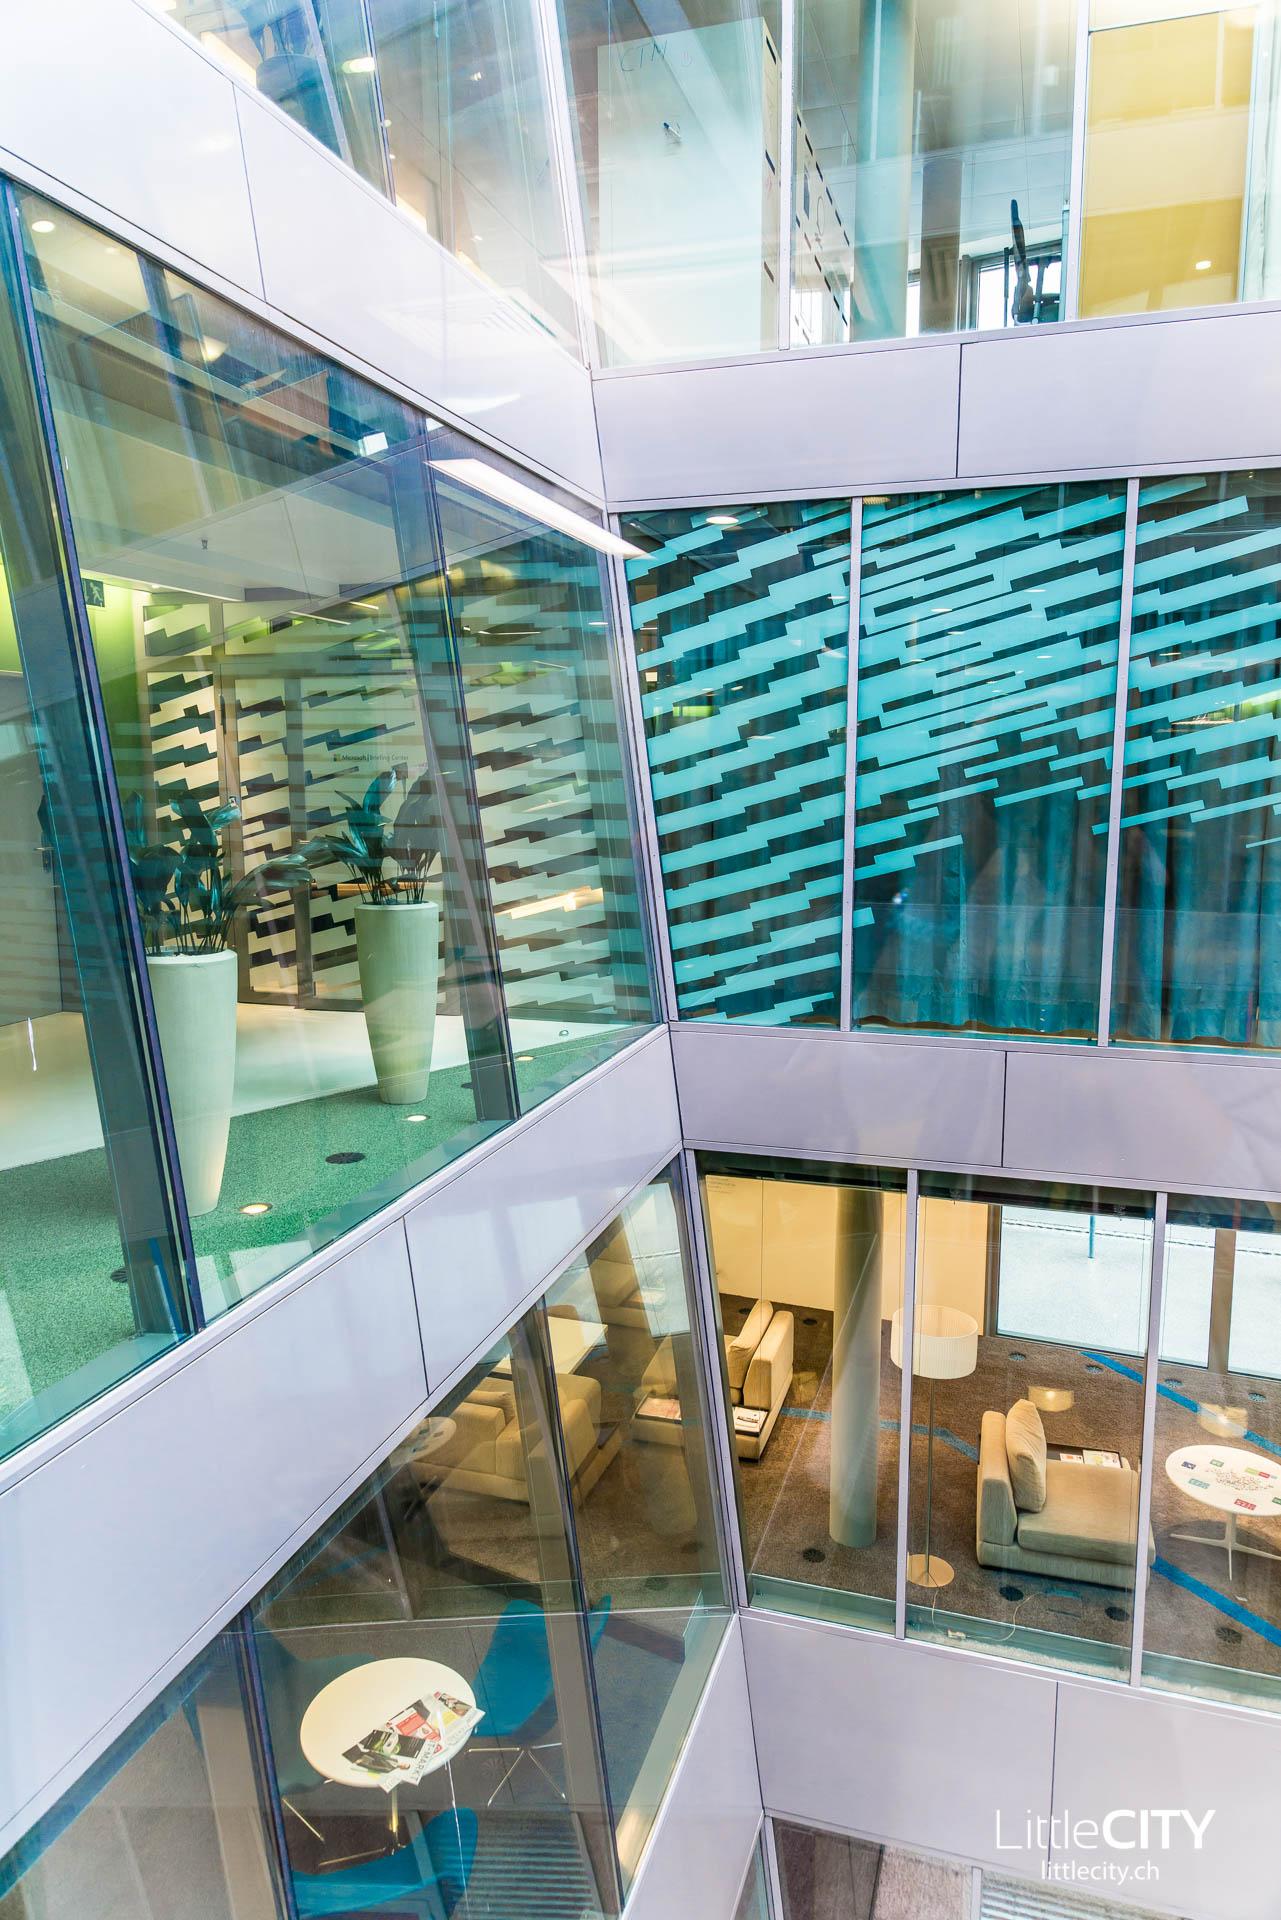 Microsoft Schweiz Büros LittleCITY-1